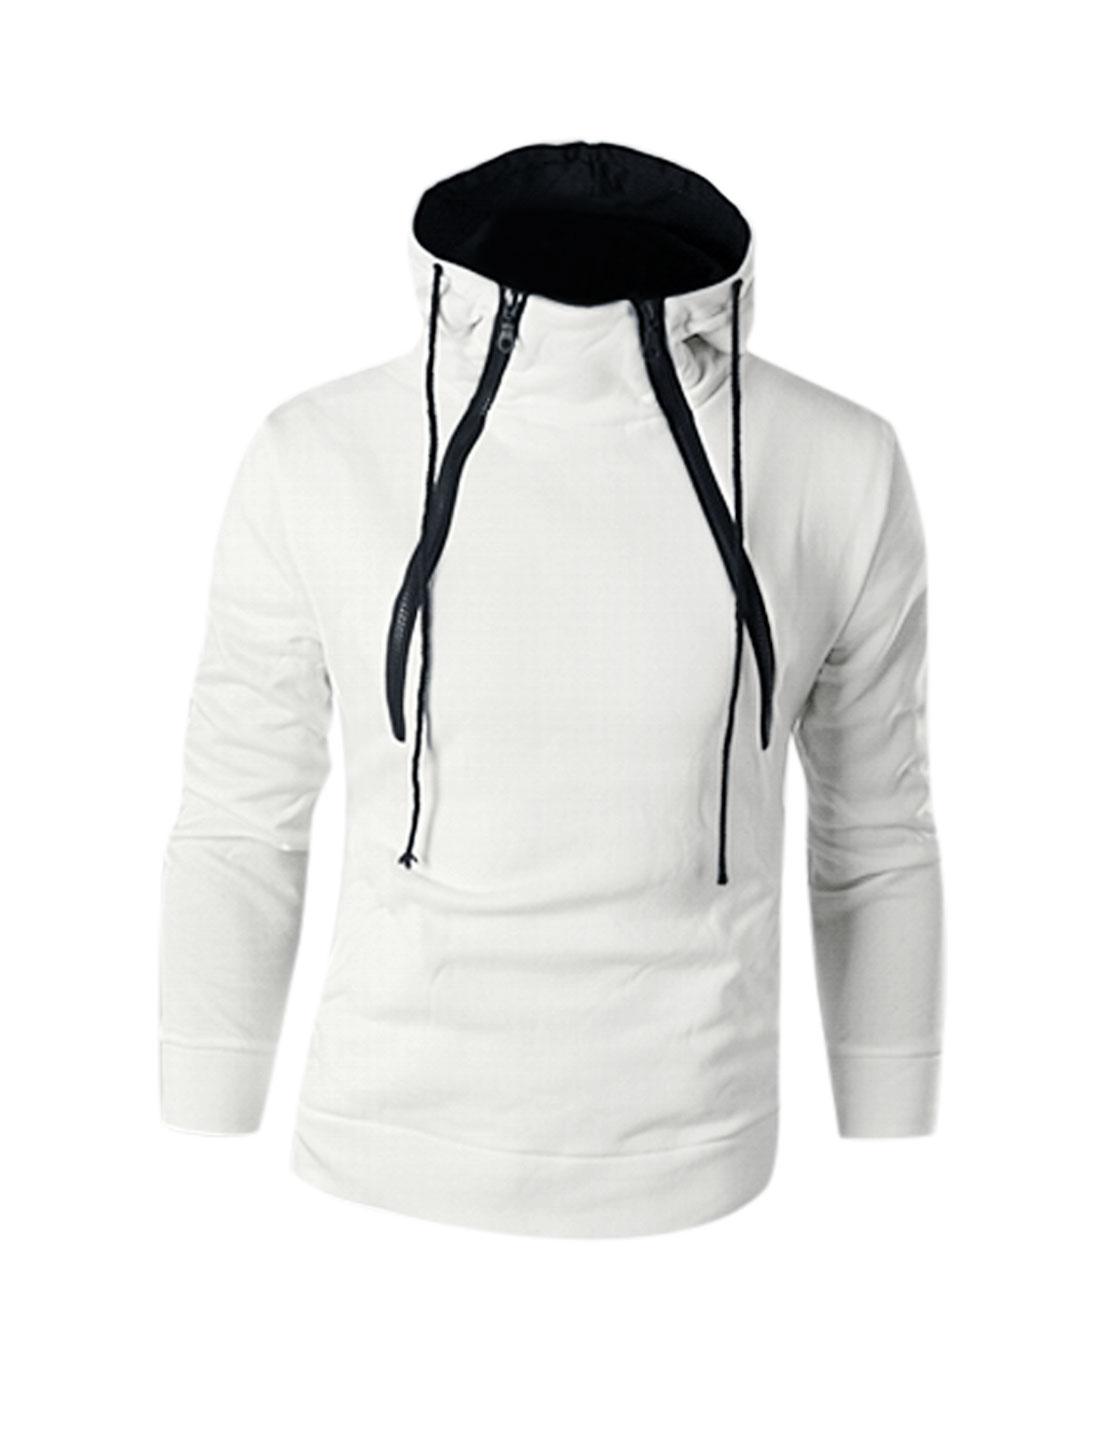 Man White Slipover Drawstring Zipper Closure Front Hooded Sweatshirt M